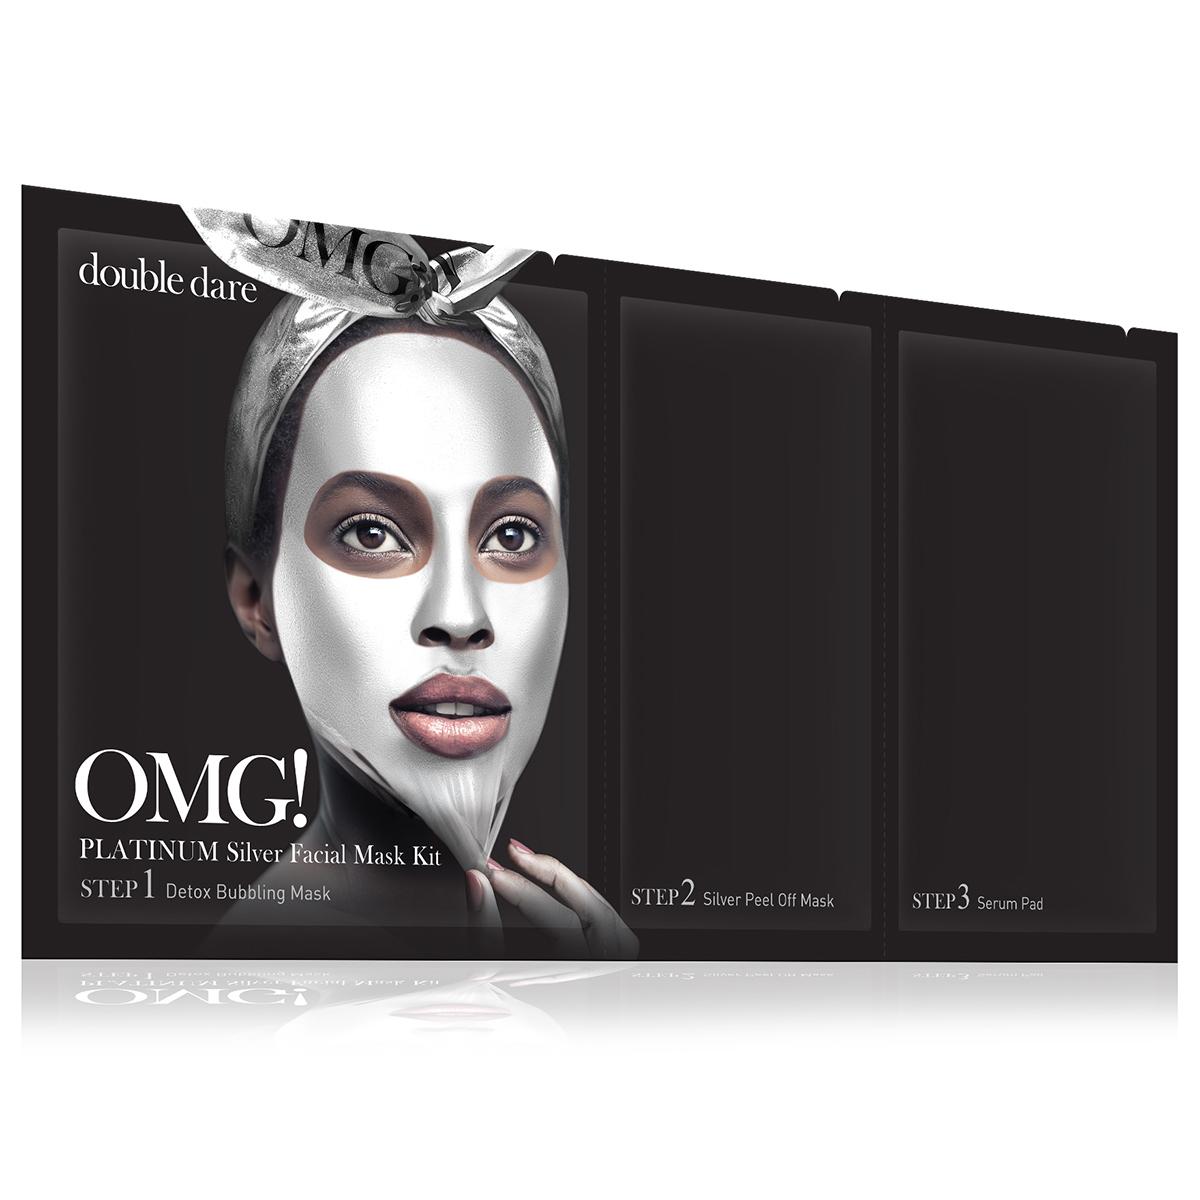 Double Dare OMG! Platinum Silver Facial Mask Kit Маска трехкомпонентная для ухода за кожей лица серебряная double dare omg маска трехкомпонентная для восстановления волос 3in1 kit hair repair system